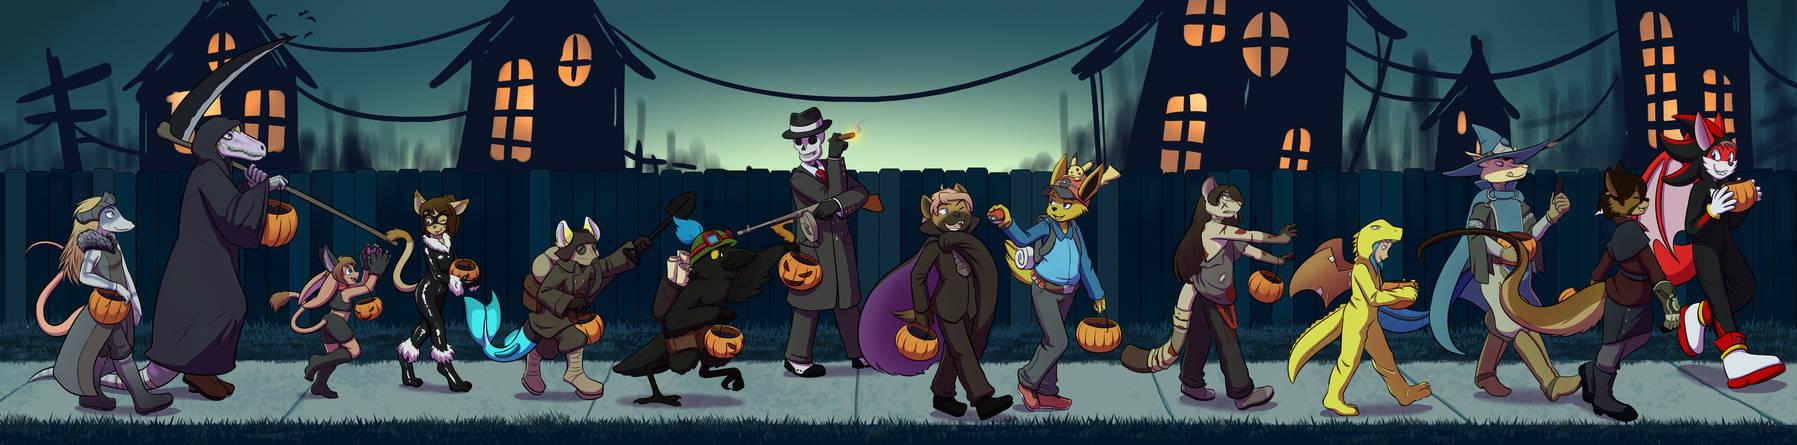 [Commission] Halloween walk